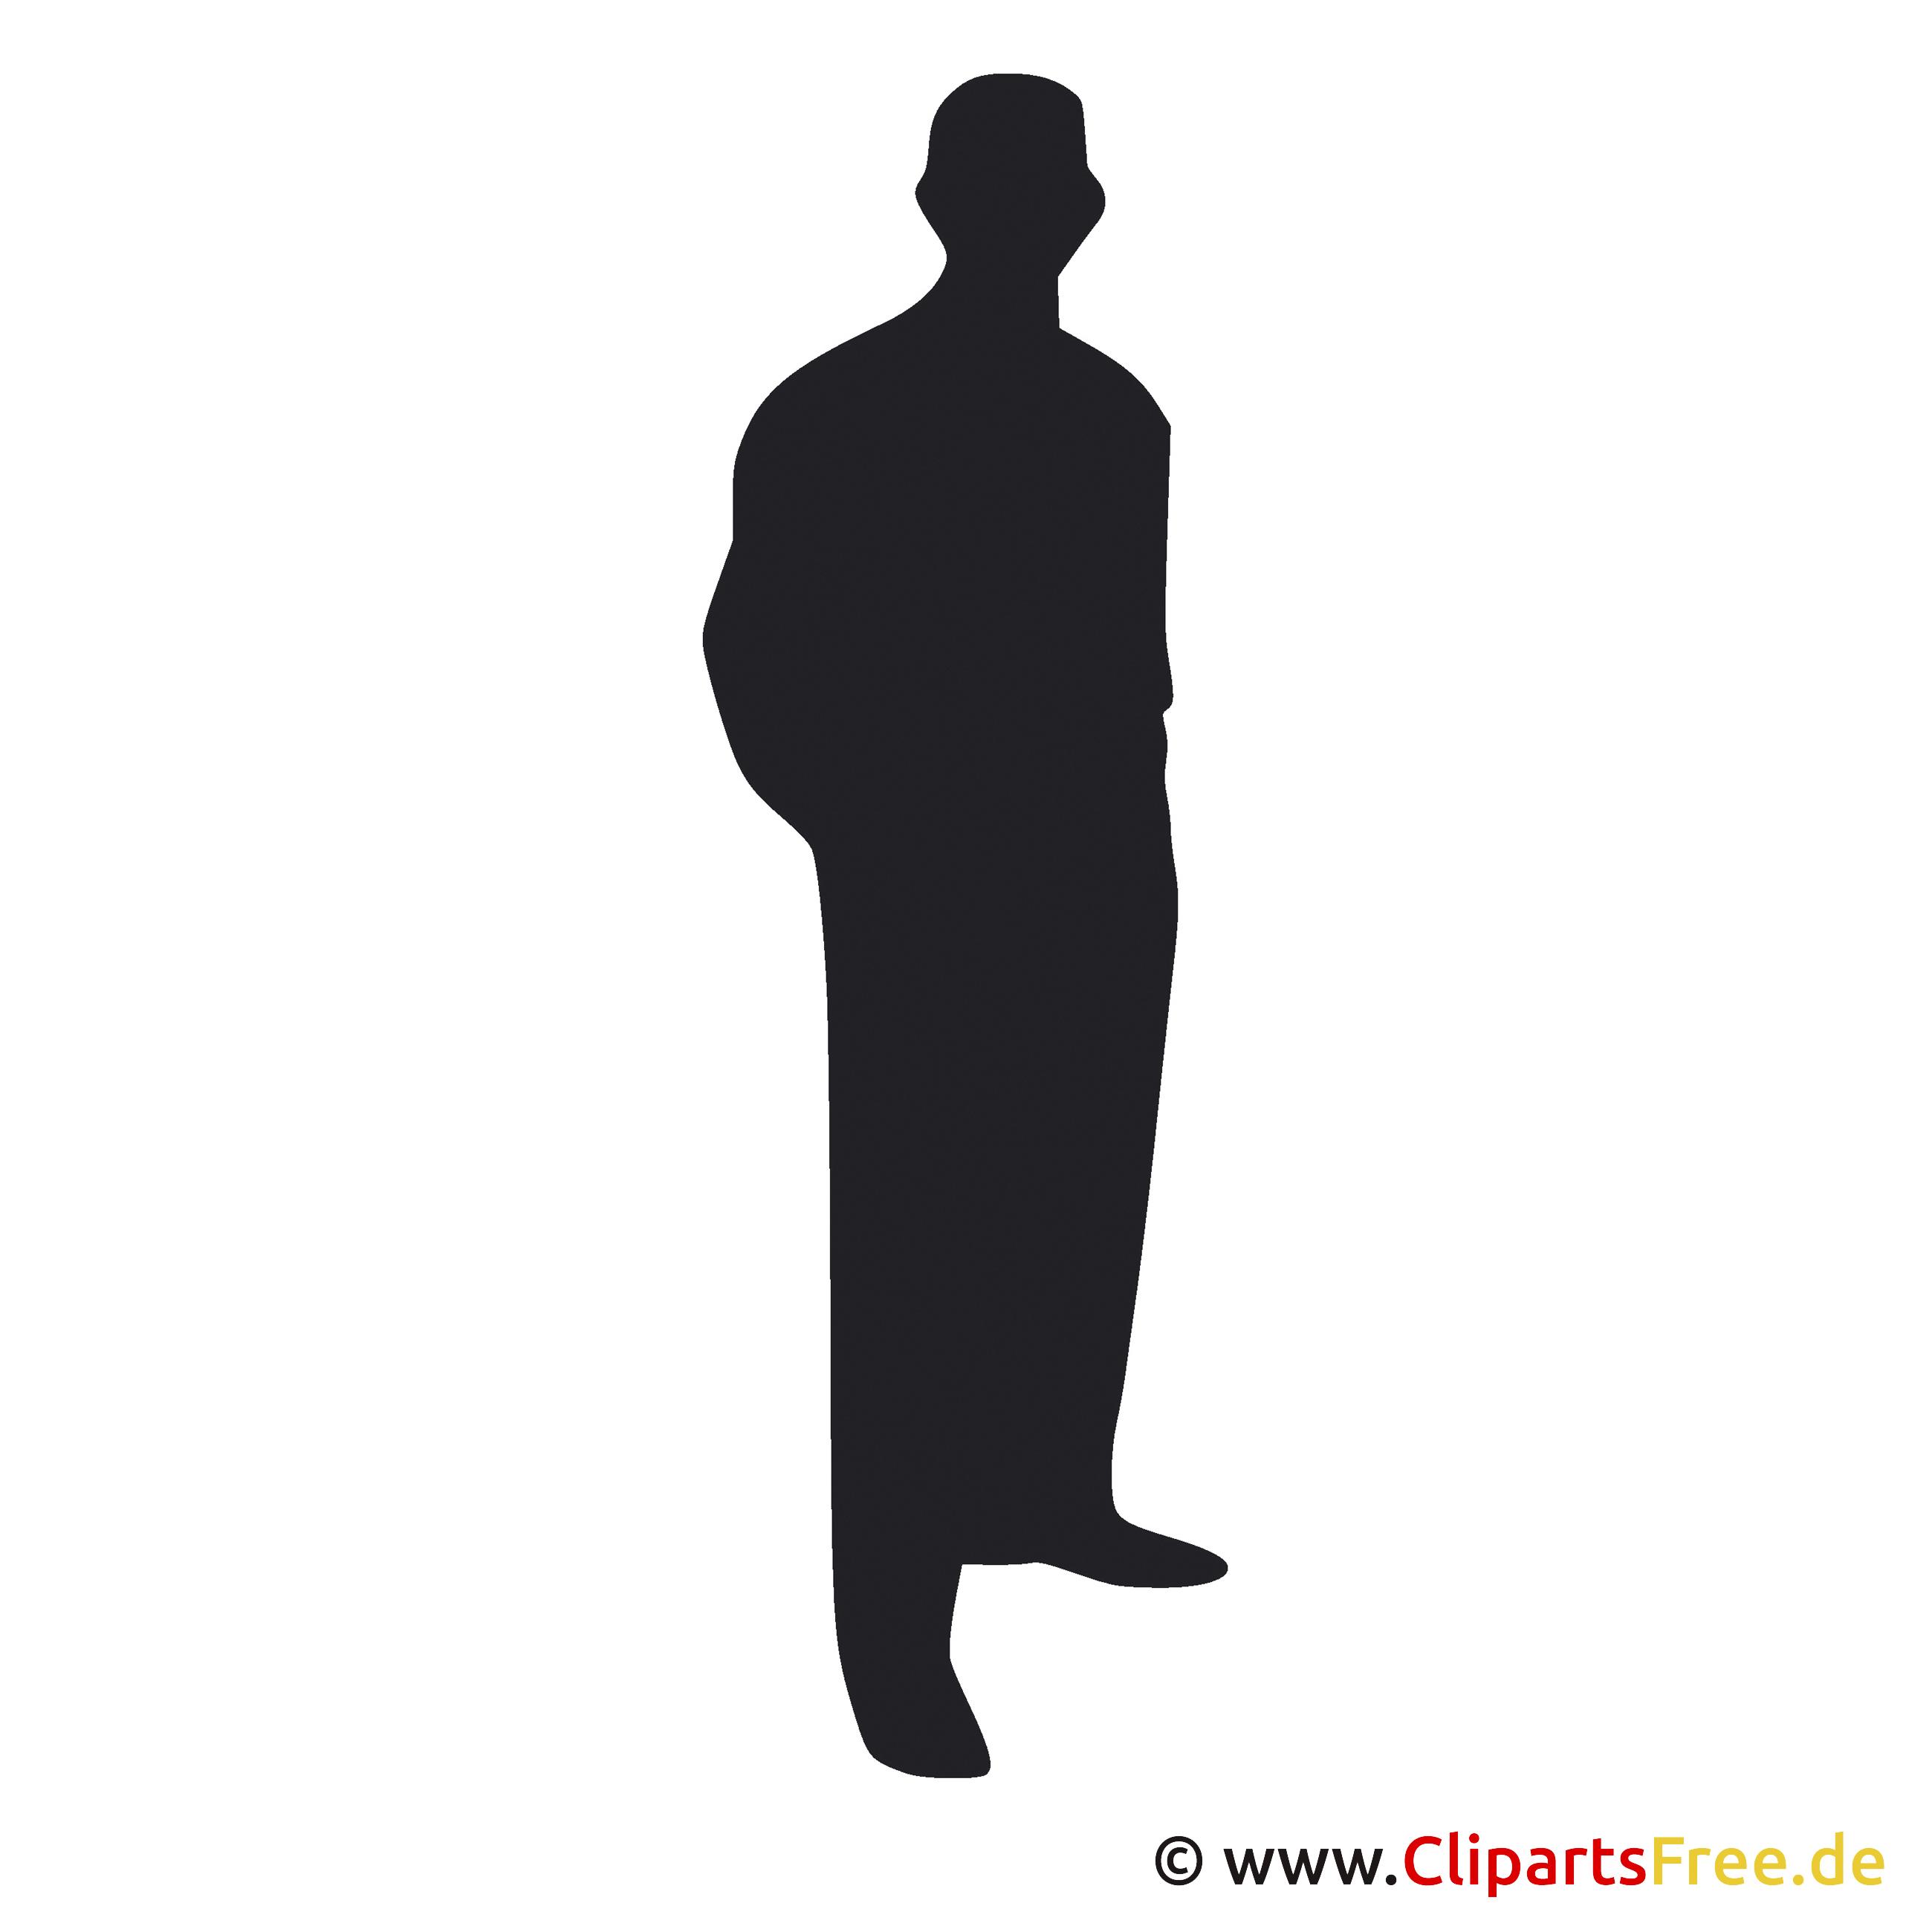 SVG Bild Businessman - Vektor Clipart